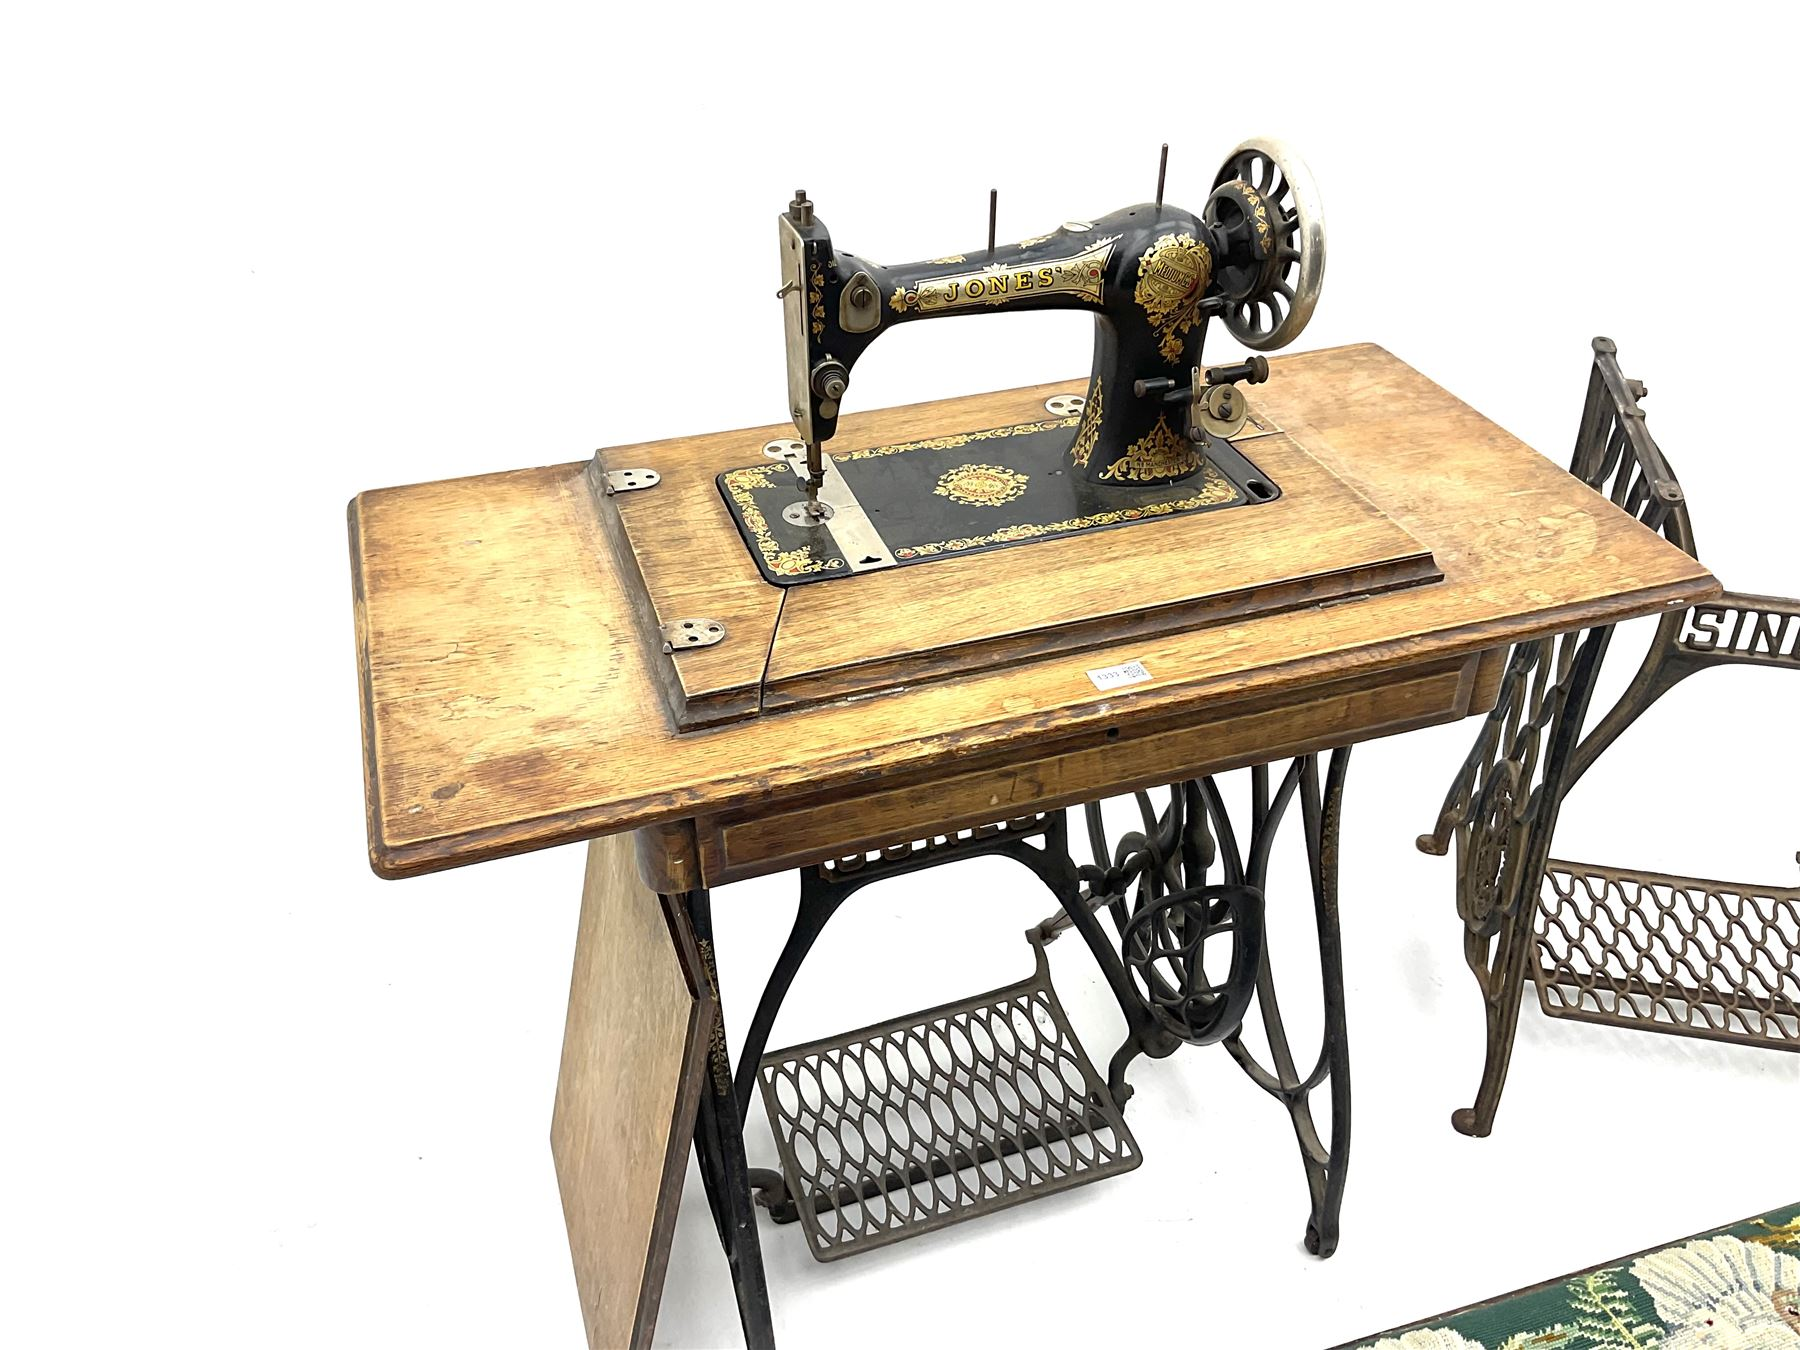 Vintage Jones treadle sewing machine - Image 3 of 3